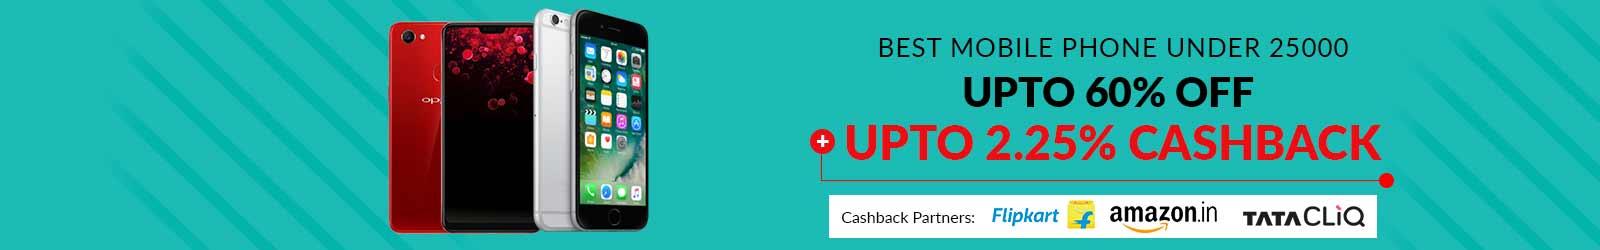 Best low cost mobile phones in india under 25000